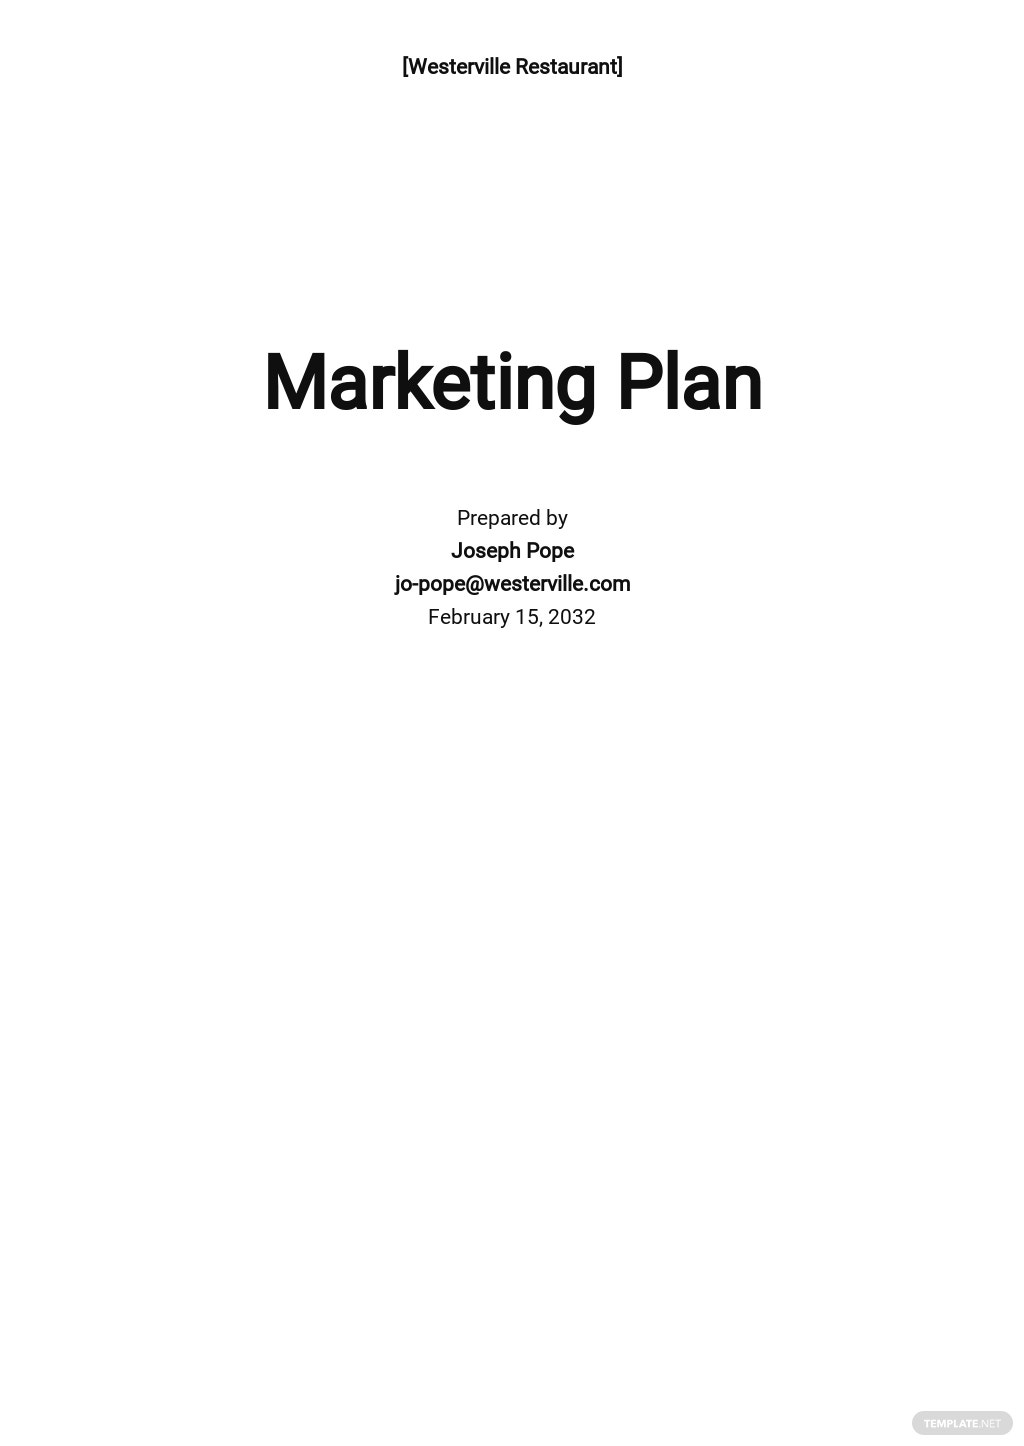 Restaurant Opening Marketing Plan Template.jpe